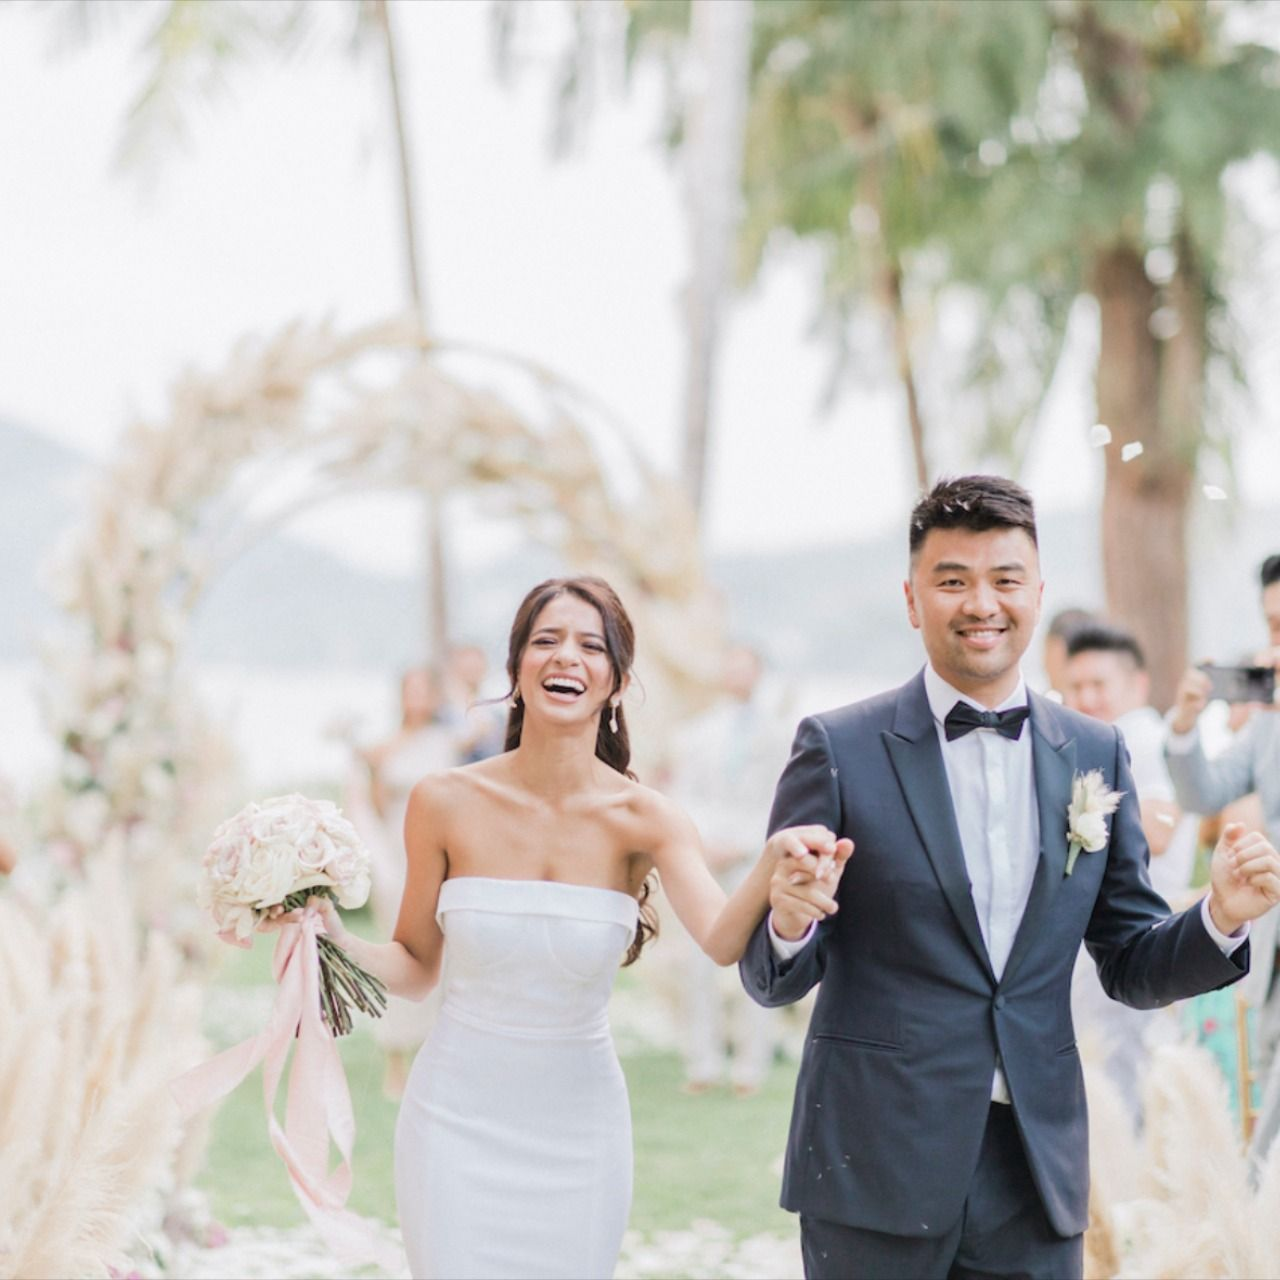 Lee Grebenau Bride An Elegant Botanical Wedding In Phuket Thailand In 2020 Thailand Wedding Bride Wedding